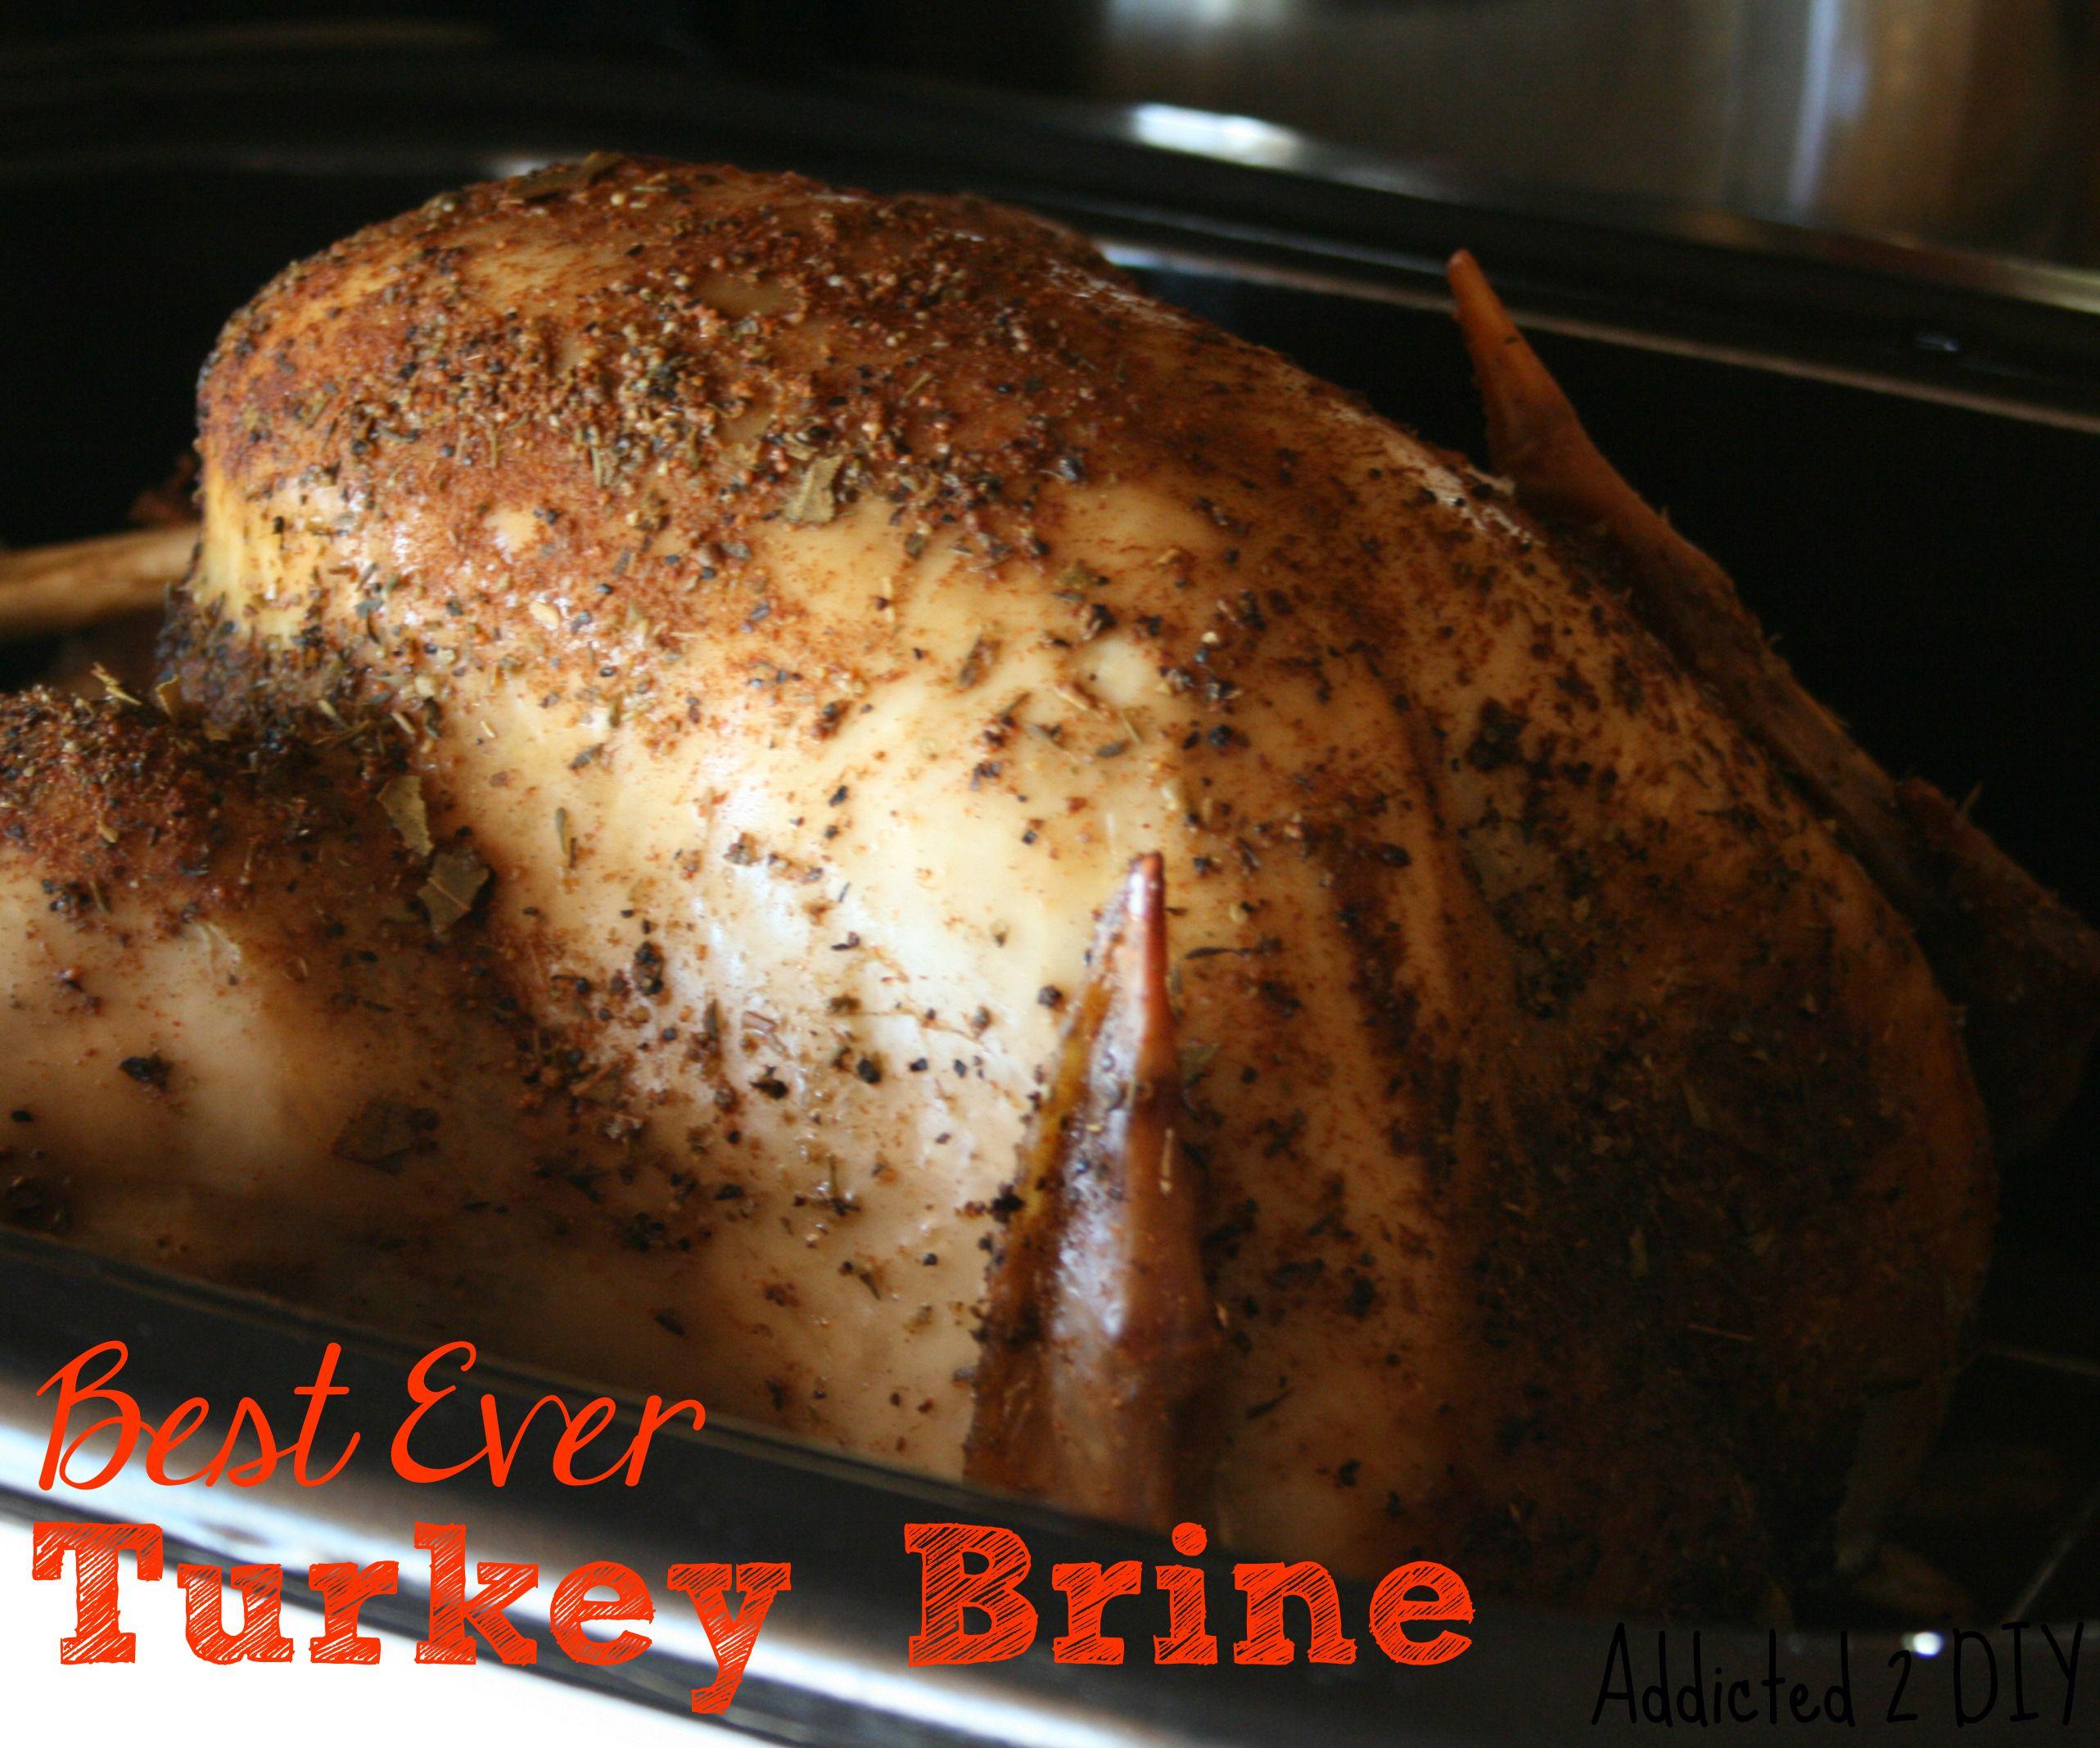 Best Ever Turkey Brine - Addicted 2 DIY